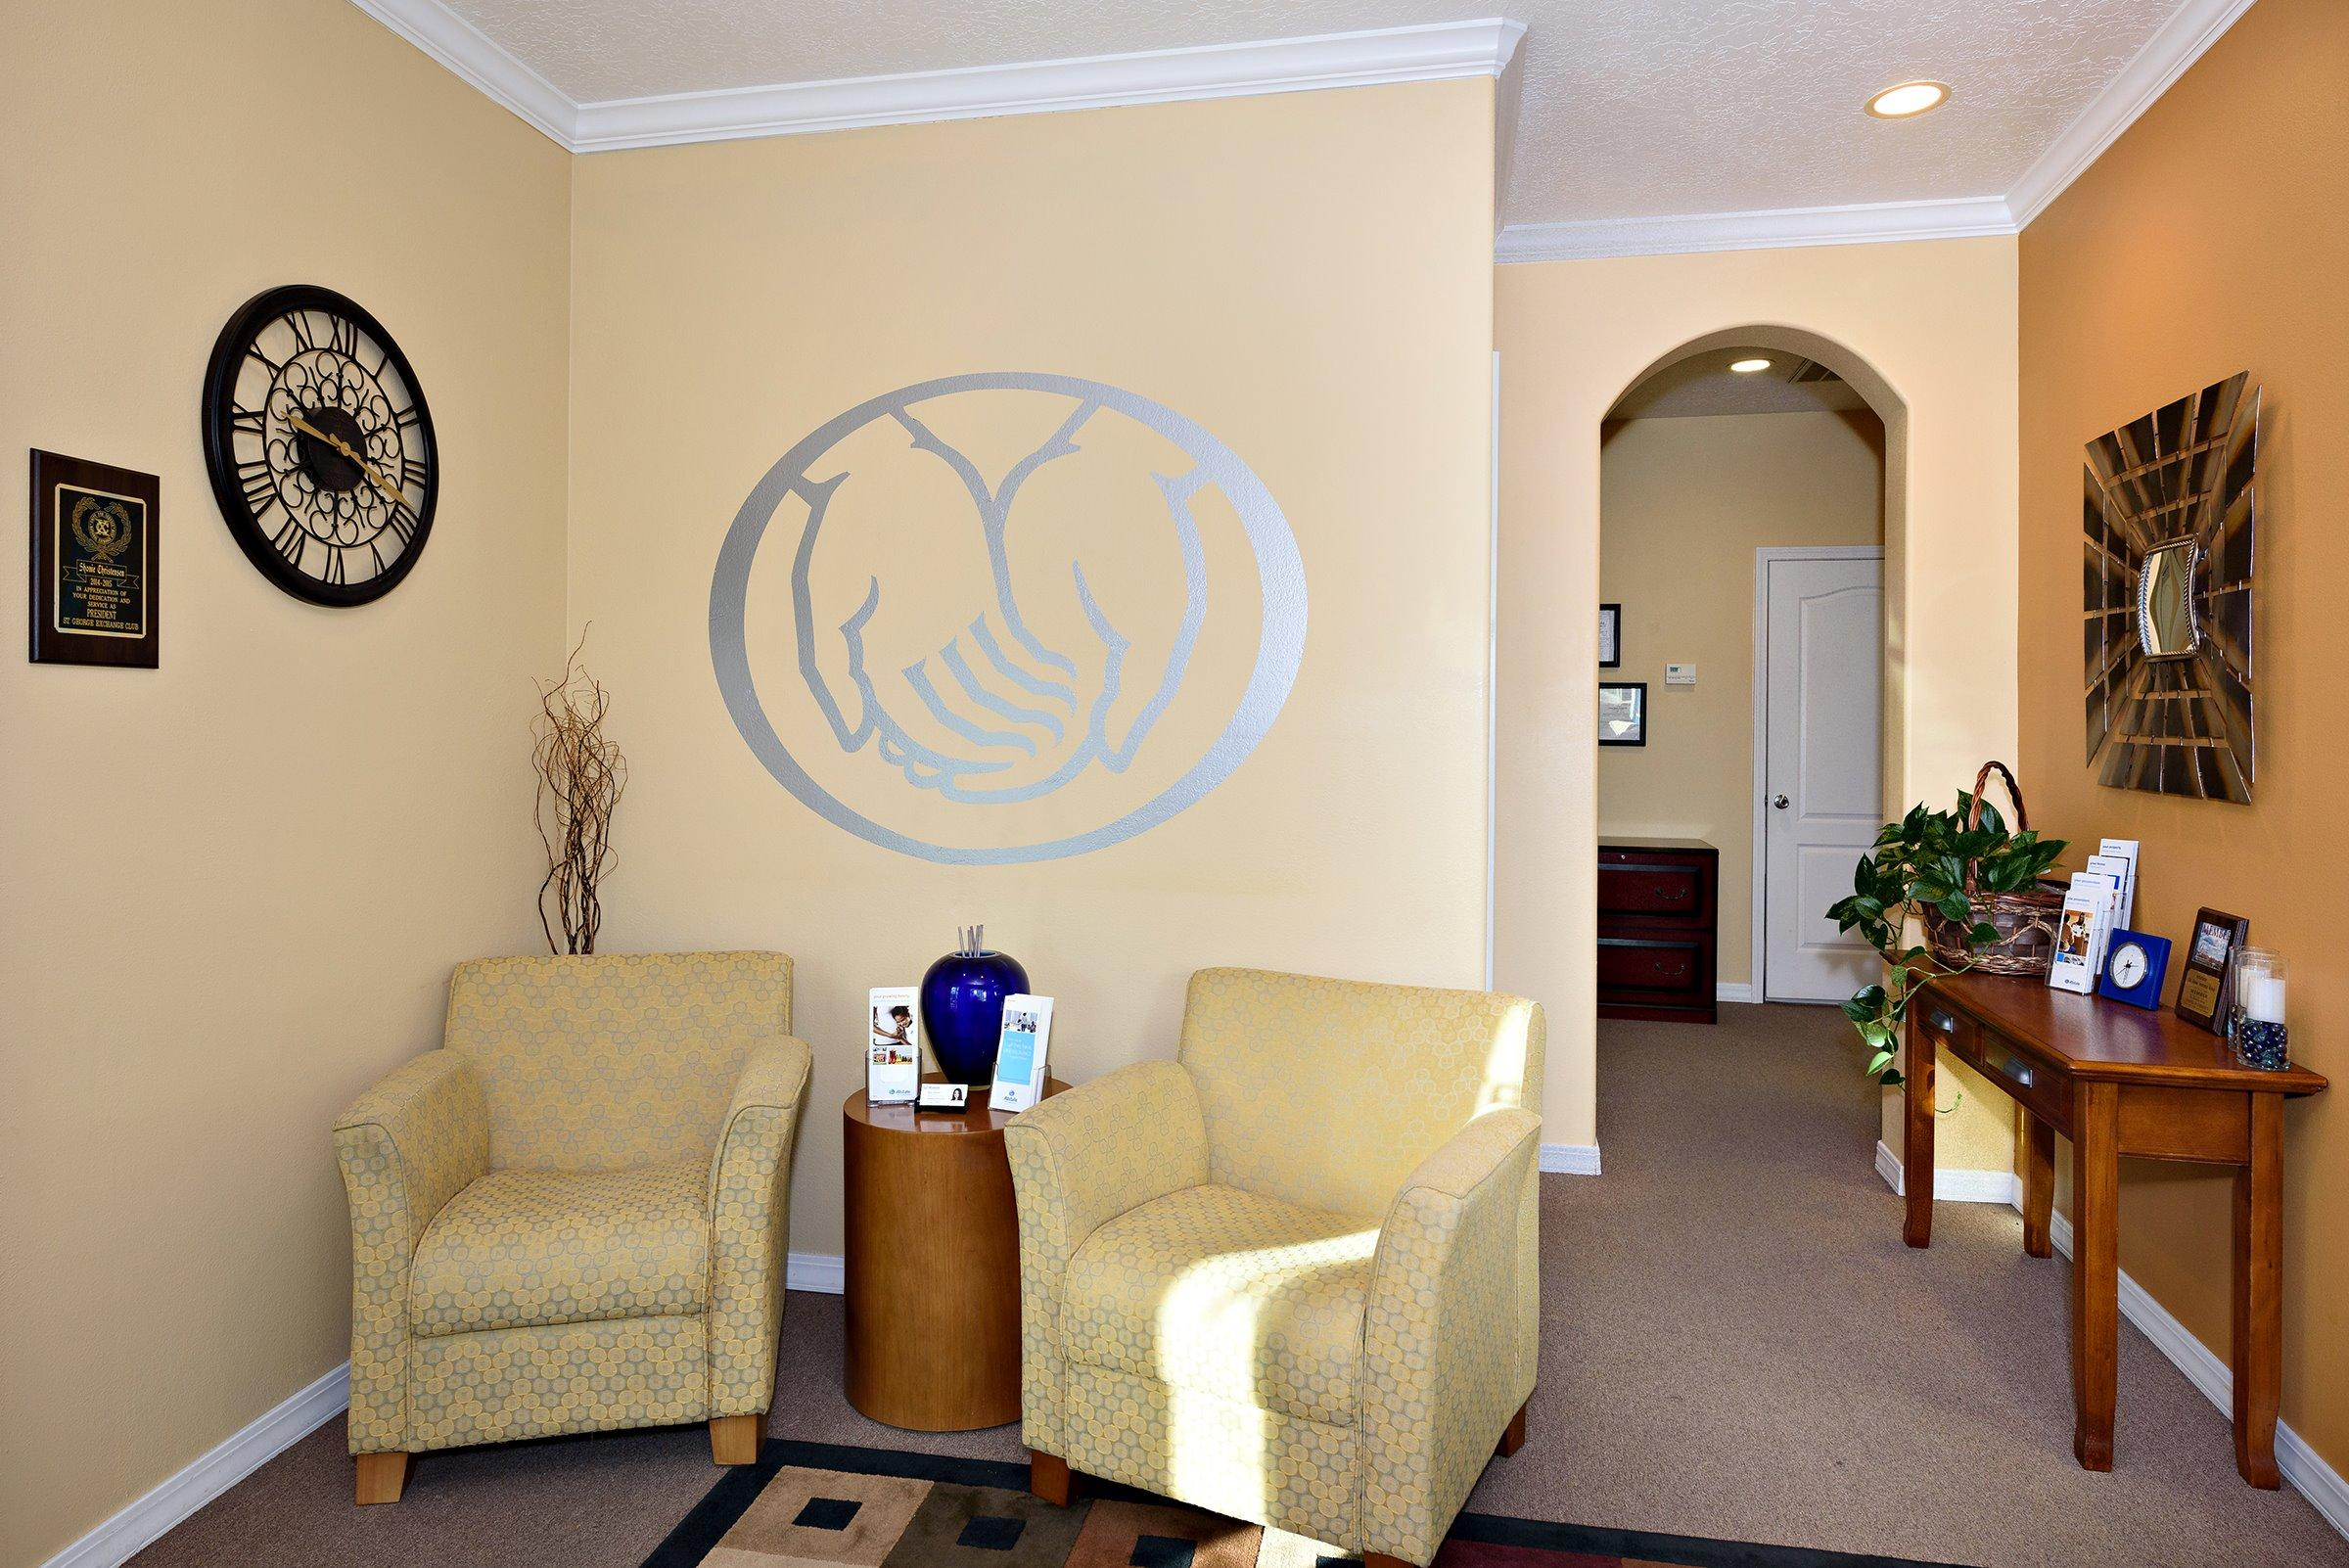 The Shonie Insurance Group, LLC: Allstate Insurance image 5